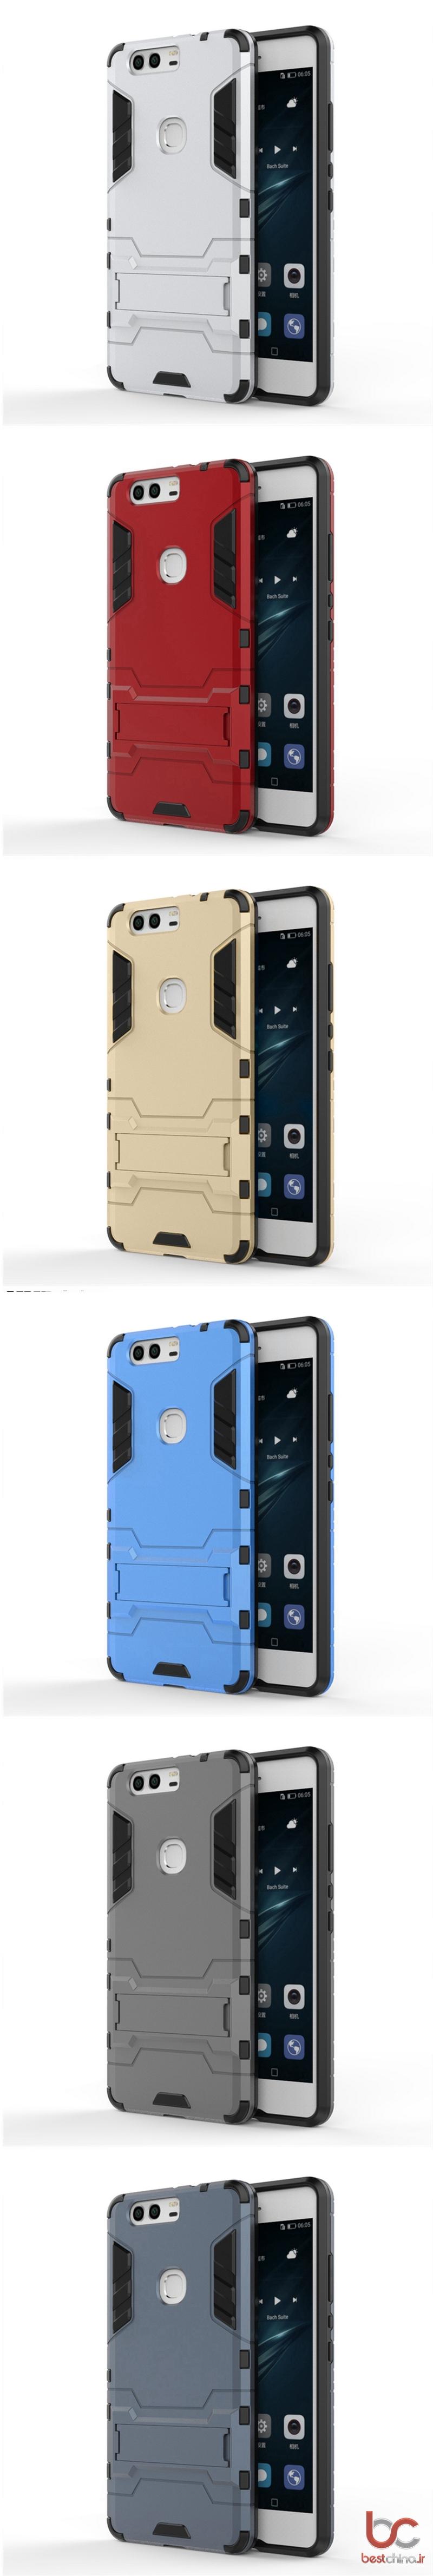 Huawei P9 TPU Back Cover (3)